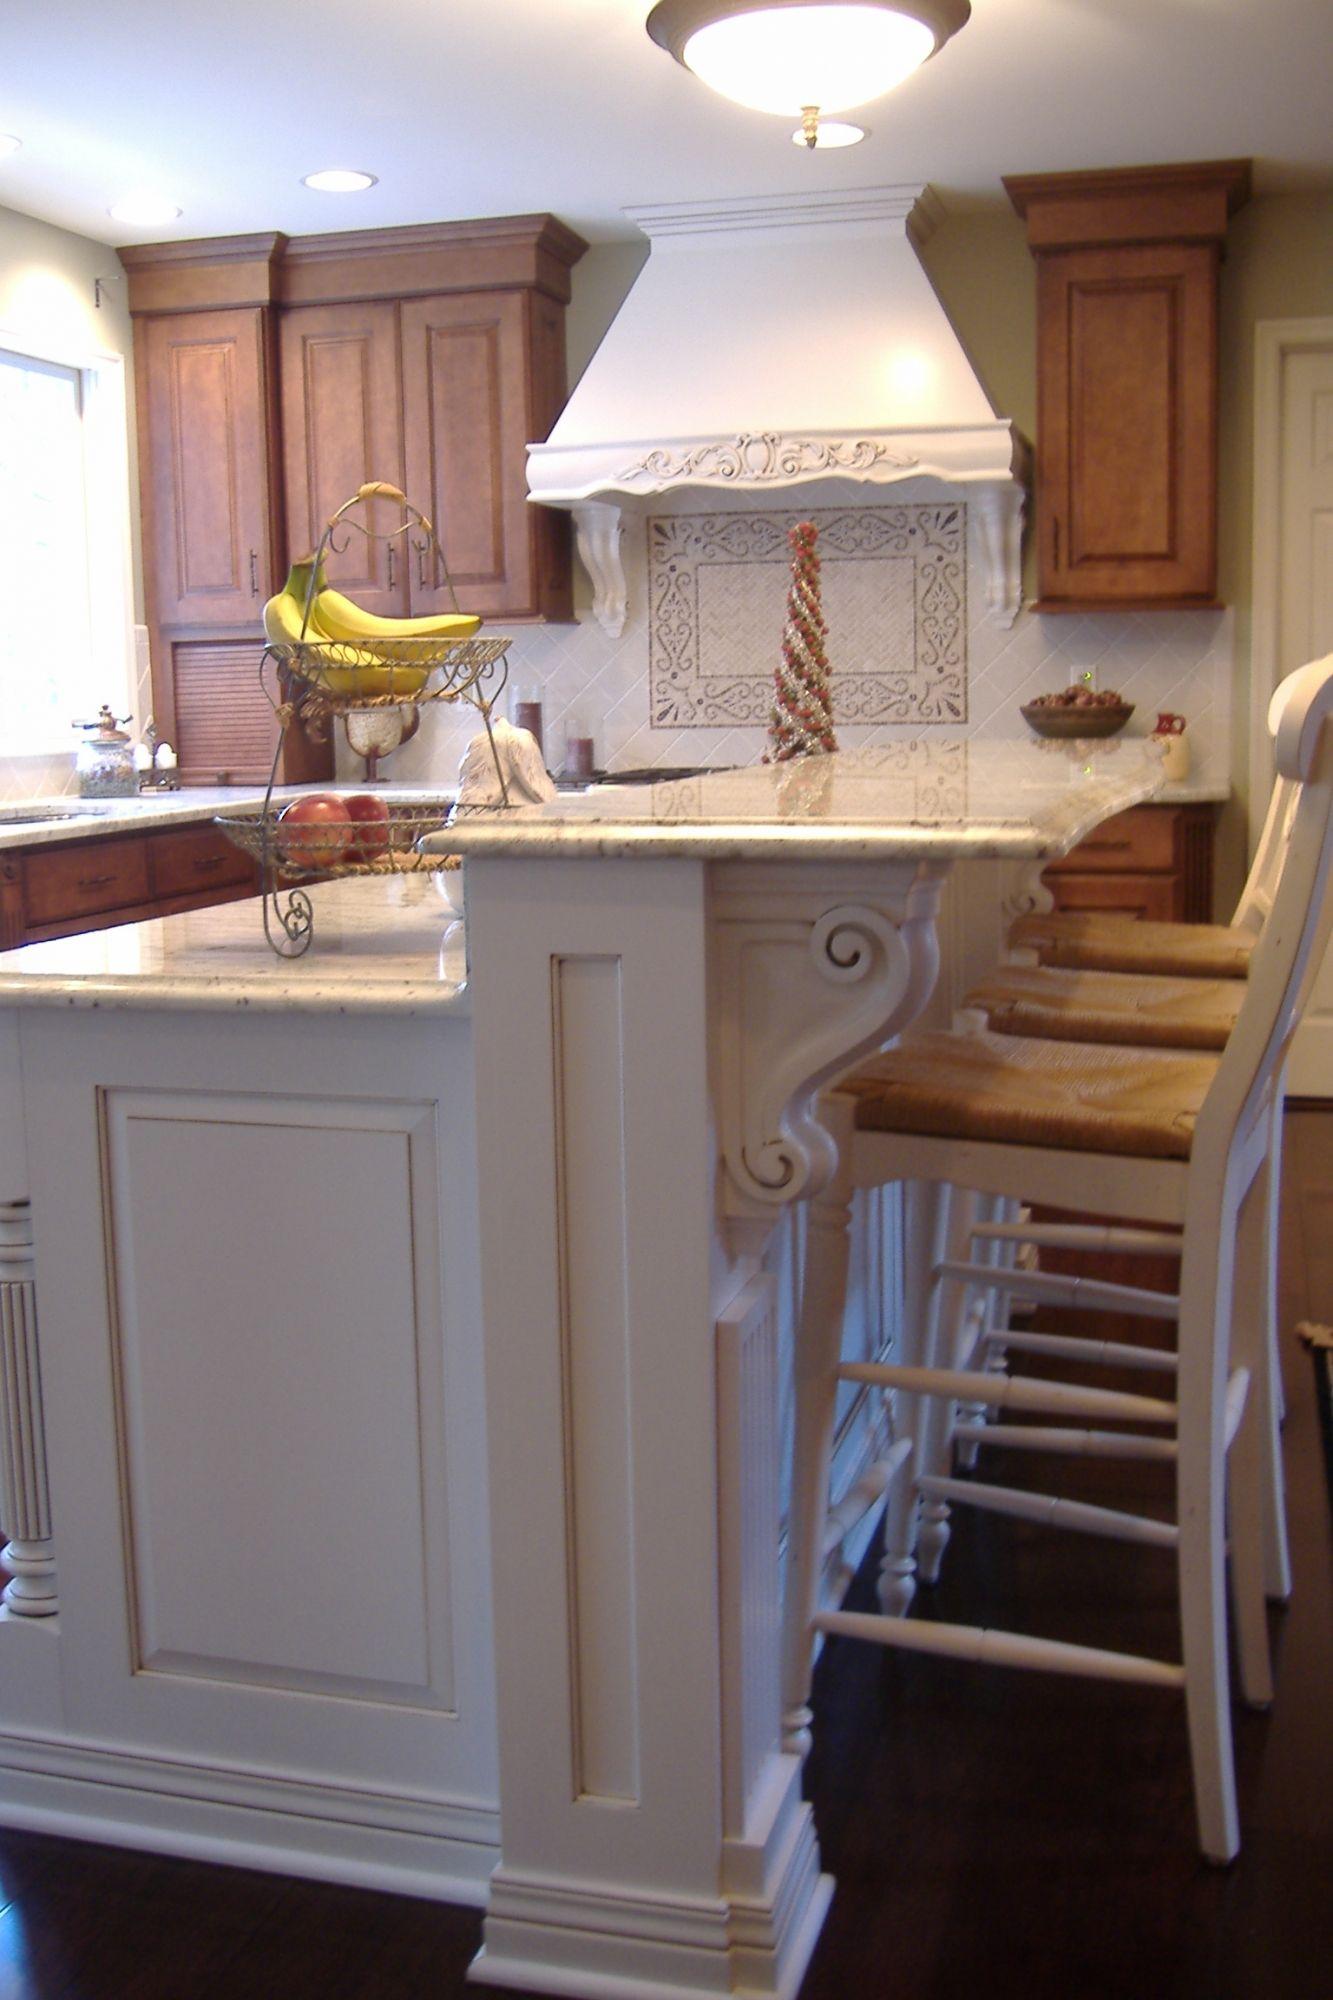 Pin By Cassandra Evard On Kitchens Kitchen Renovation Budget Kitchen Remodel Replacing Kitchen Countertops